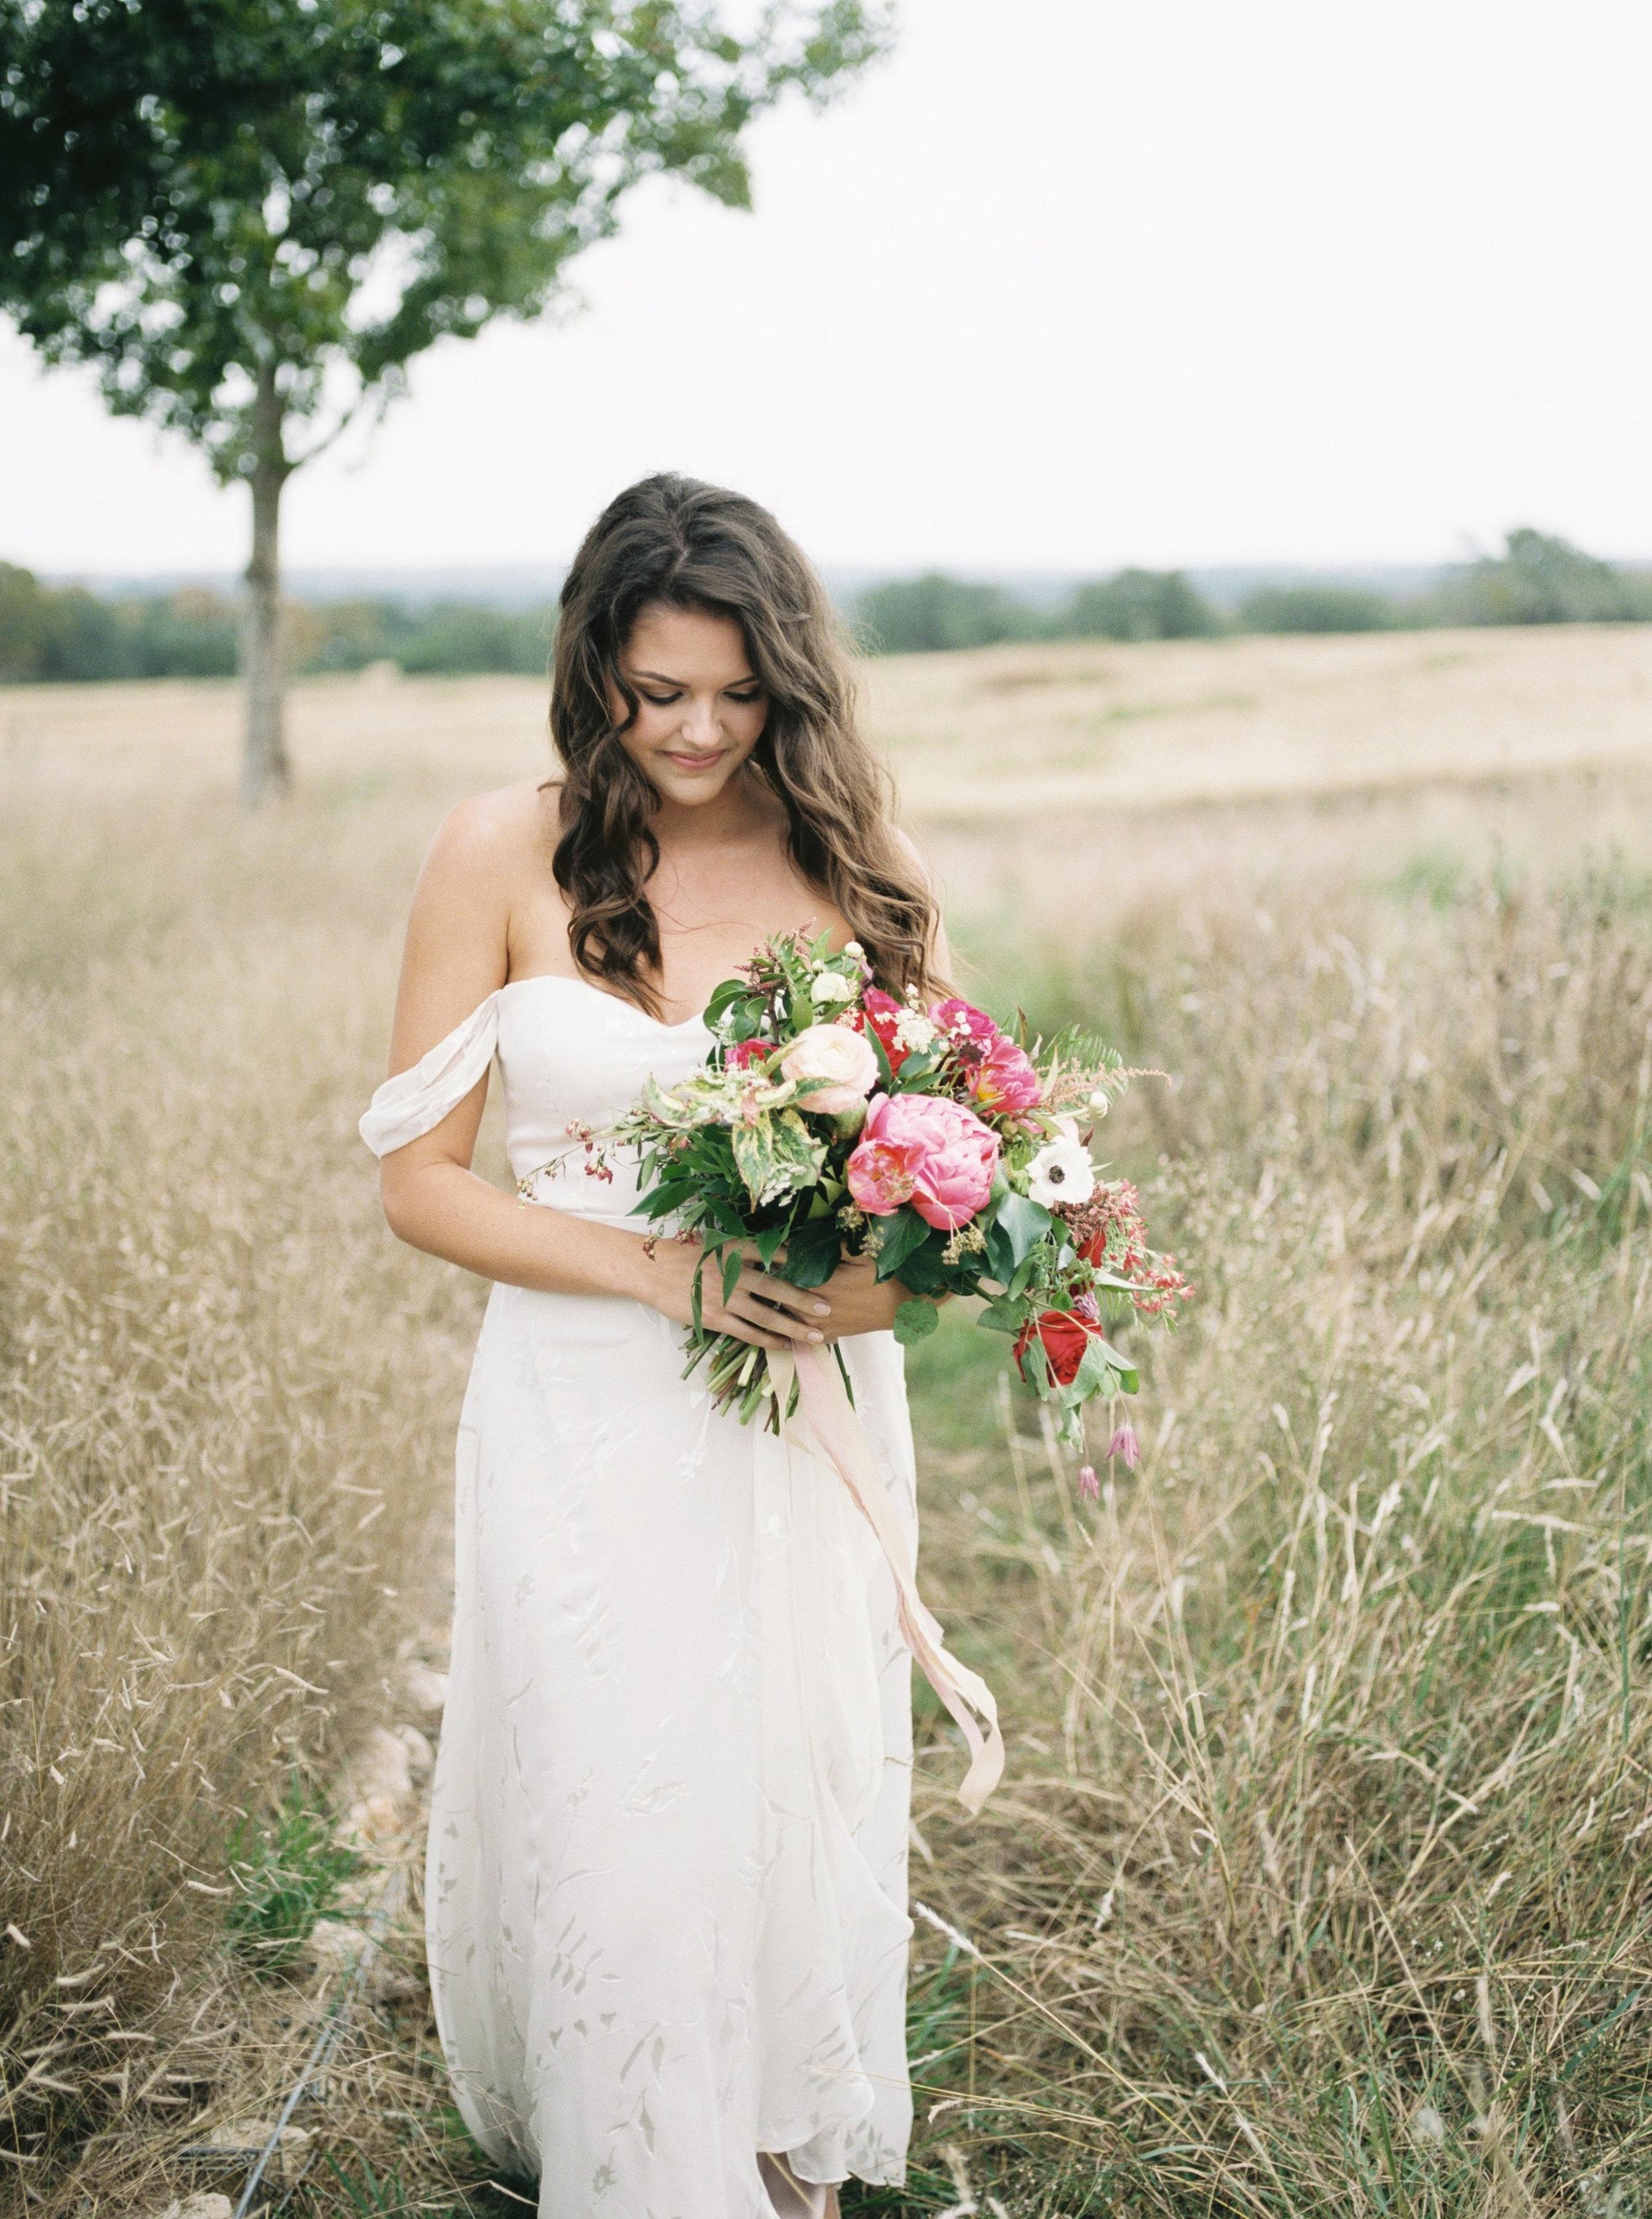 Austin beautiful bridal portrait inspiration